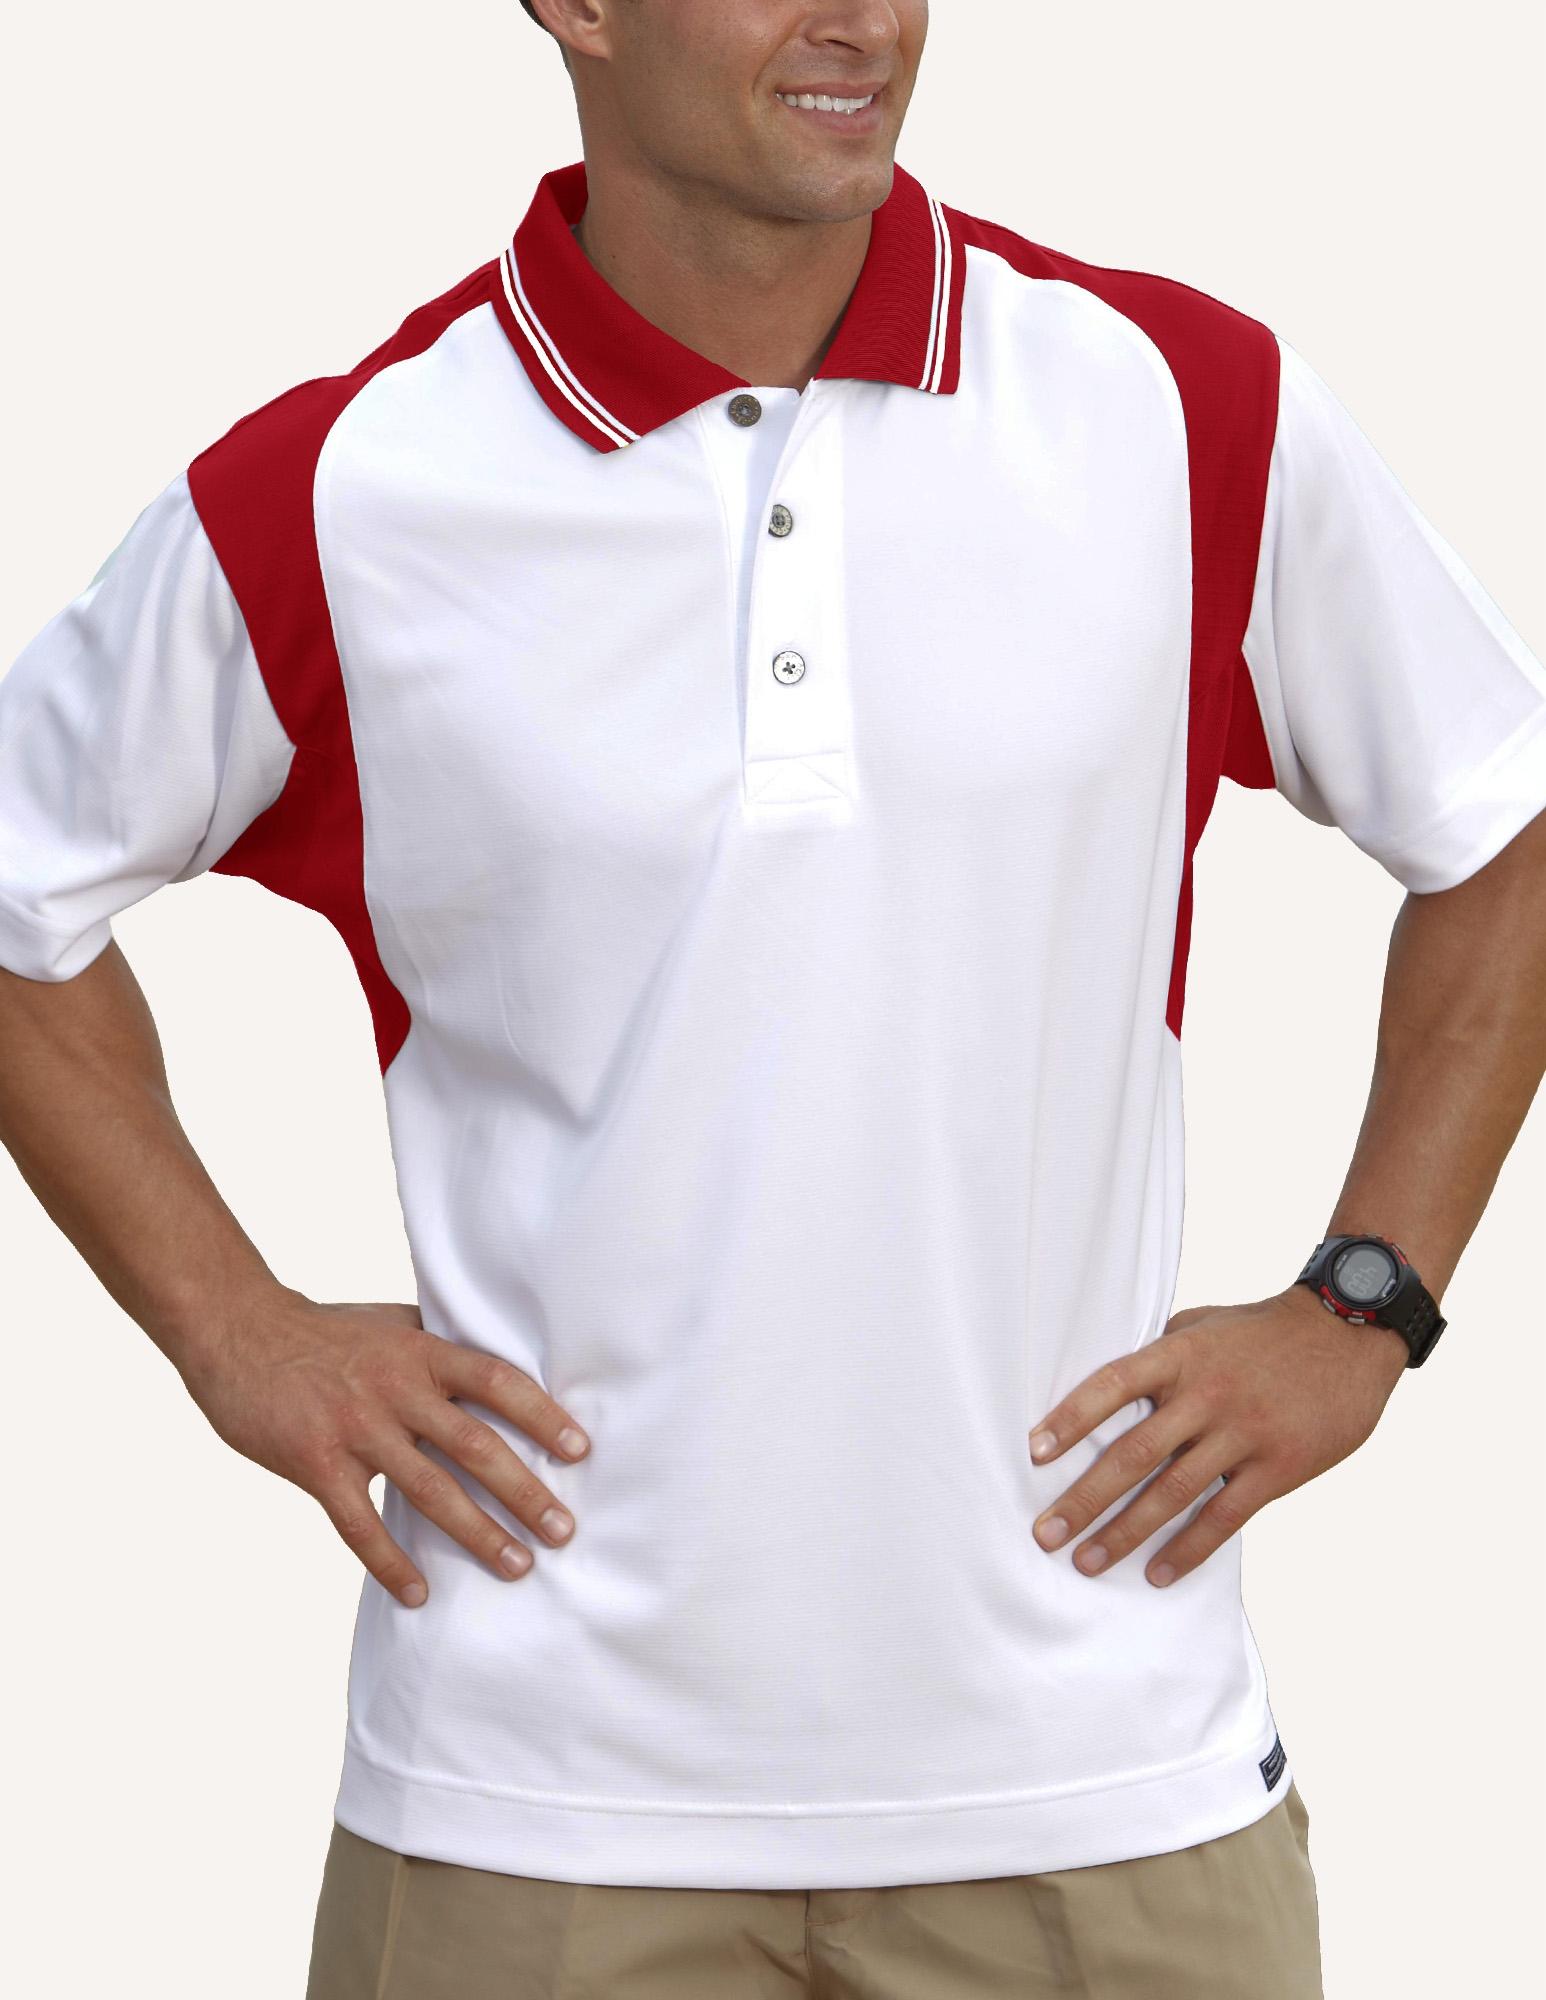 Blank Polo Shirts - JiffyShirts.com